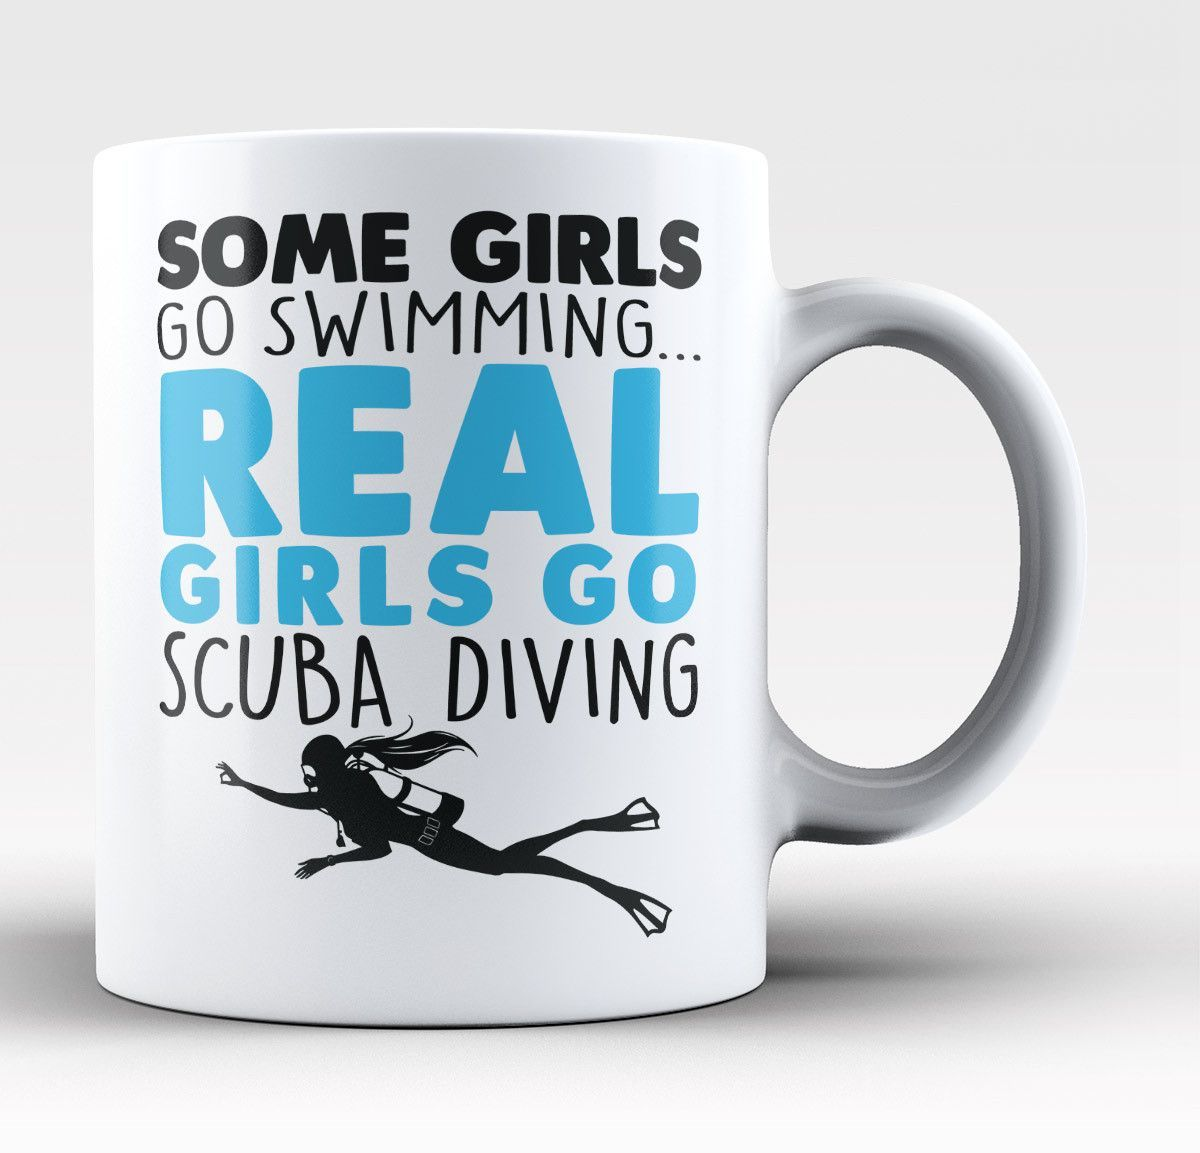 Real Girls Go Scuba Diving Coffee Mug Tea Cup